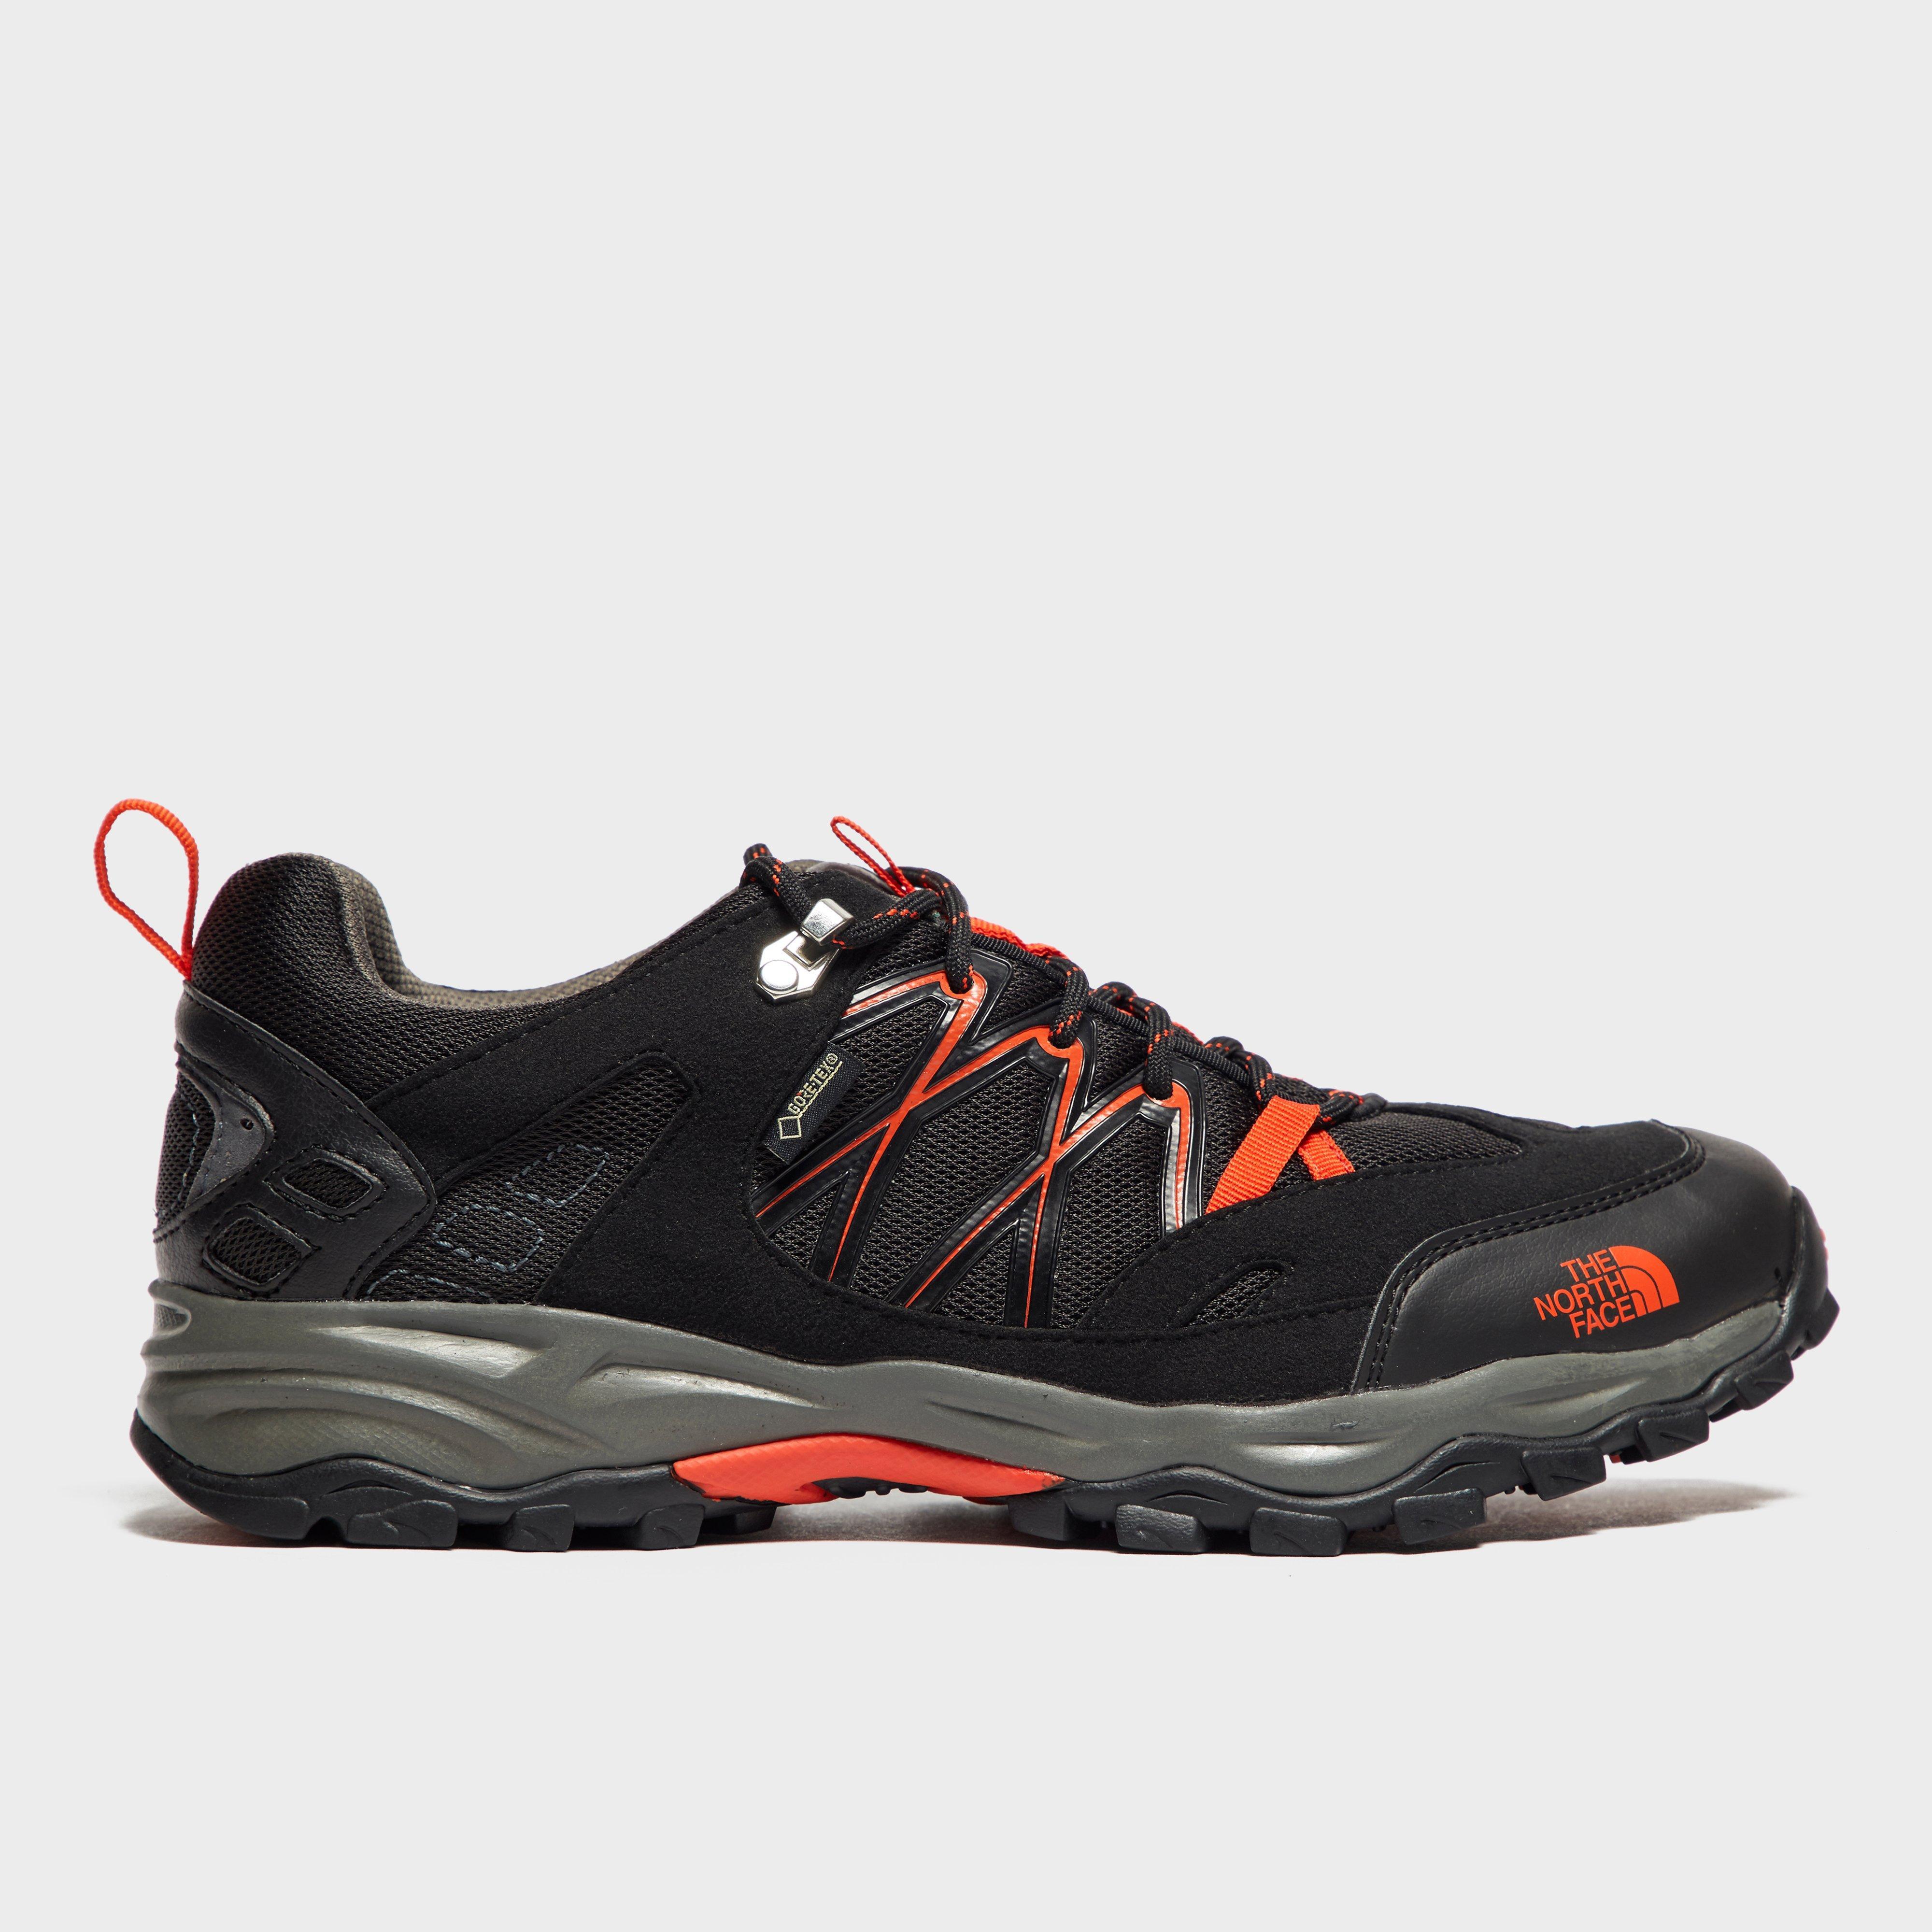 The North Face Men's Terra GORE-TEX Shoe - Black, Black Review thumbnail